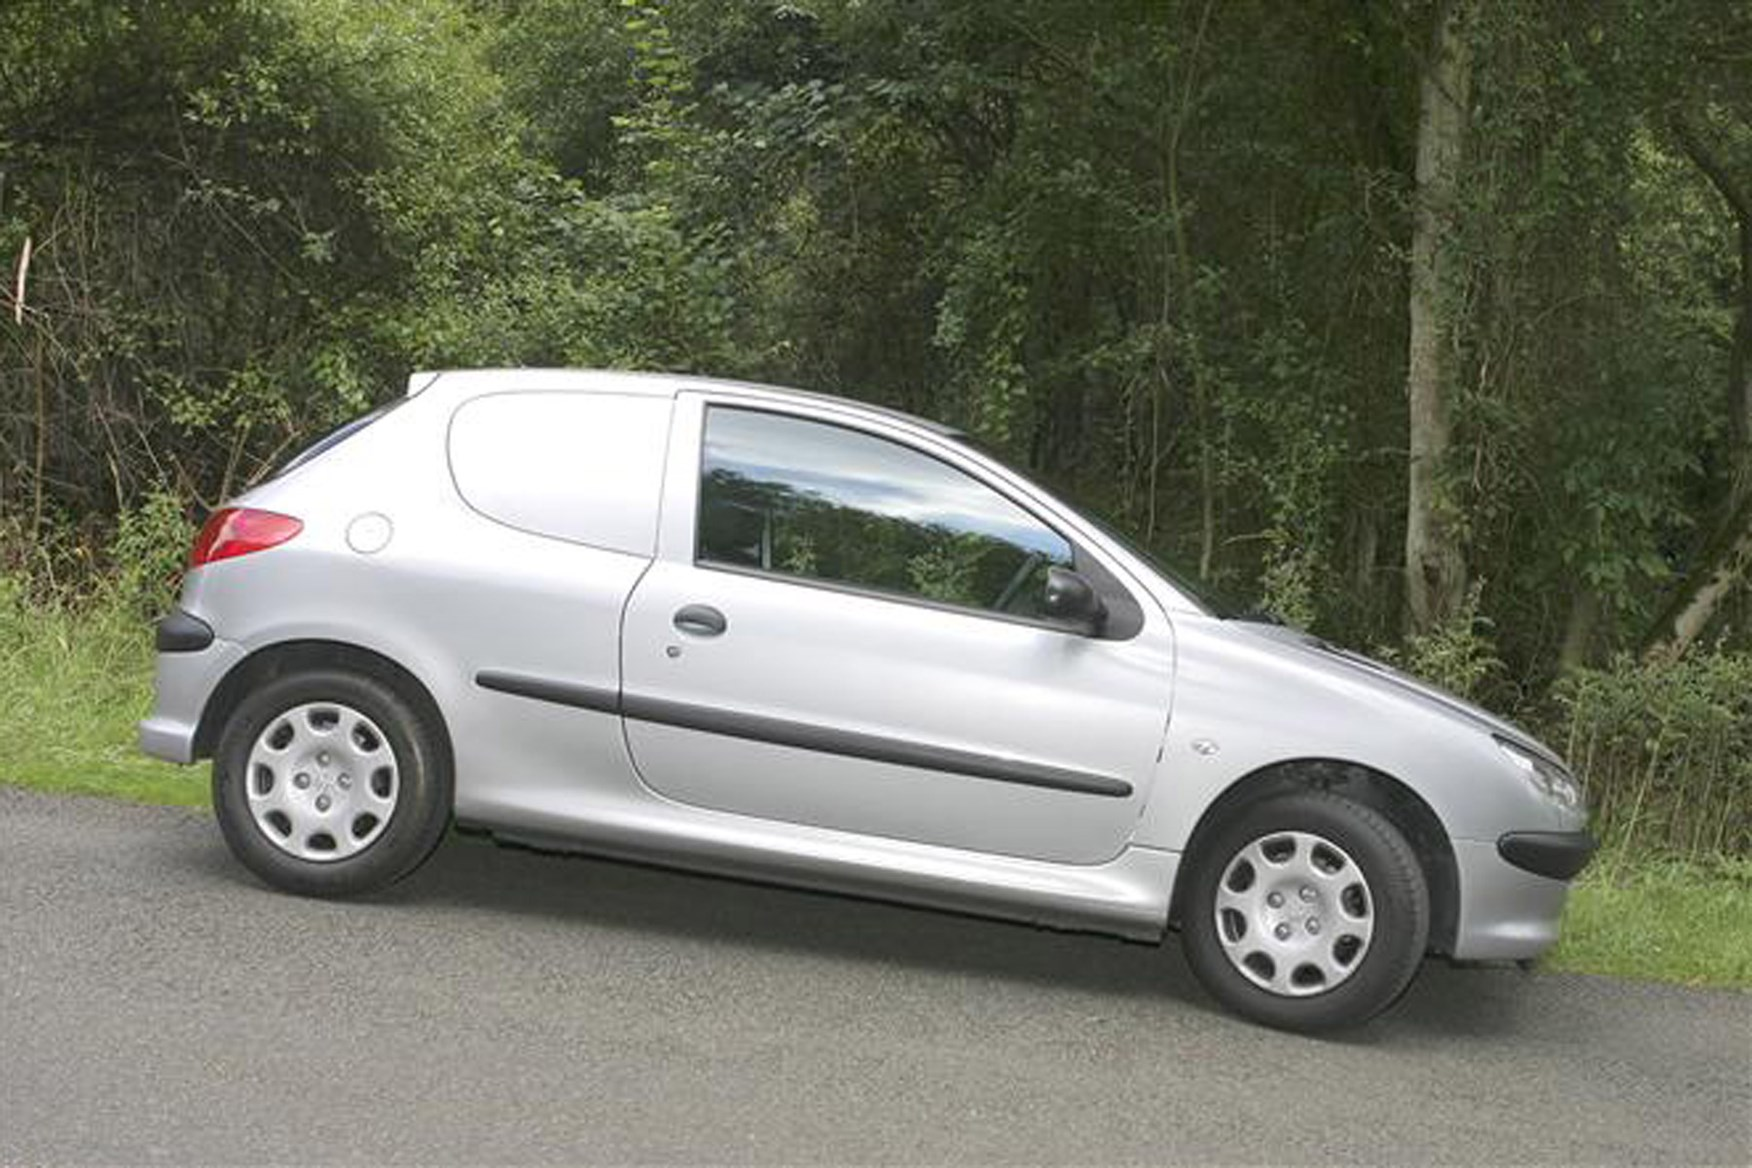 Peugeot 206 Van review on Parkers Vans - side exterior